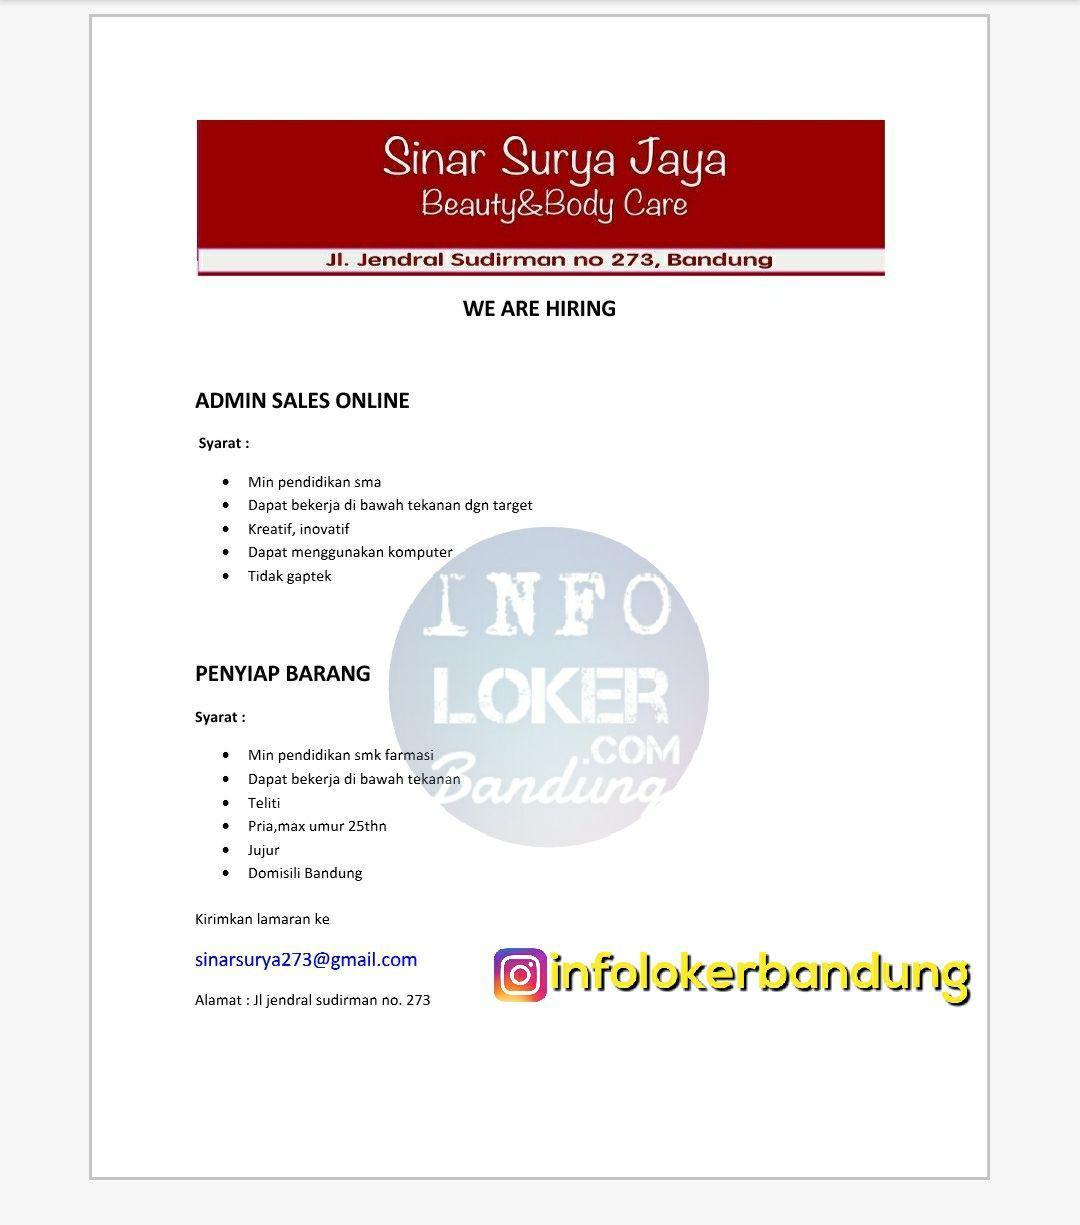 Lowongan Kerja Sinar Surya Jaya Bandung November 2017 width=